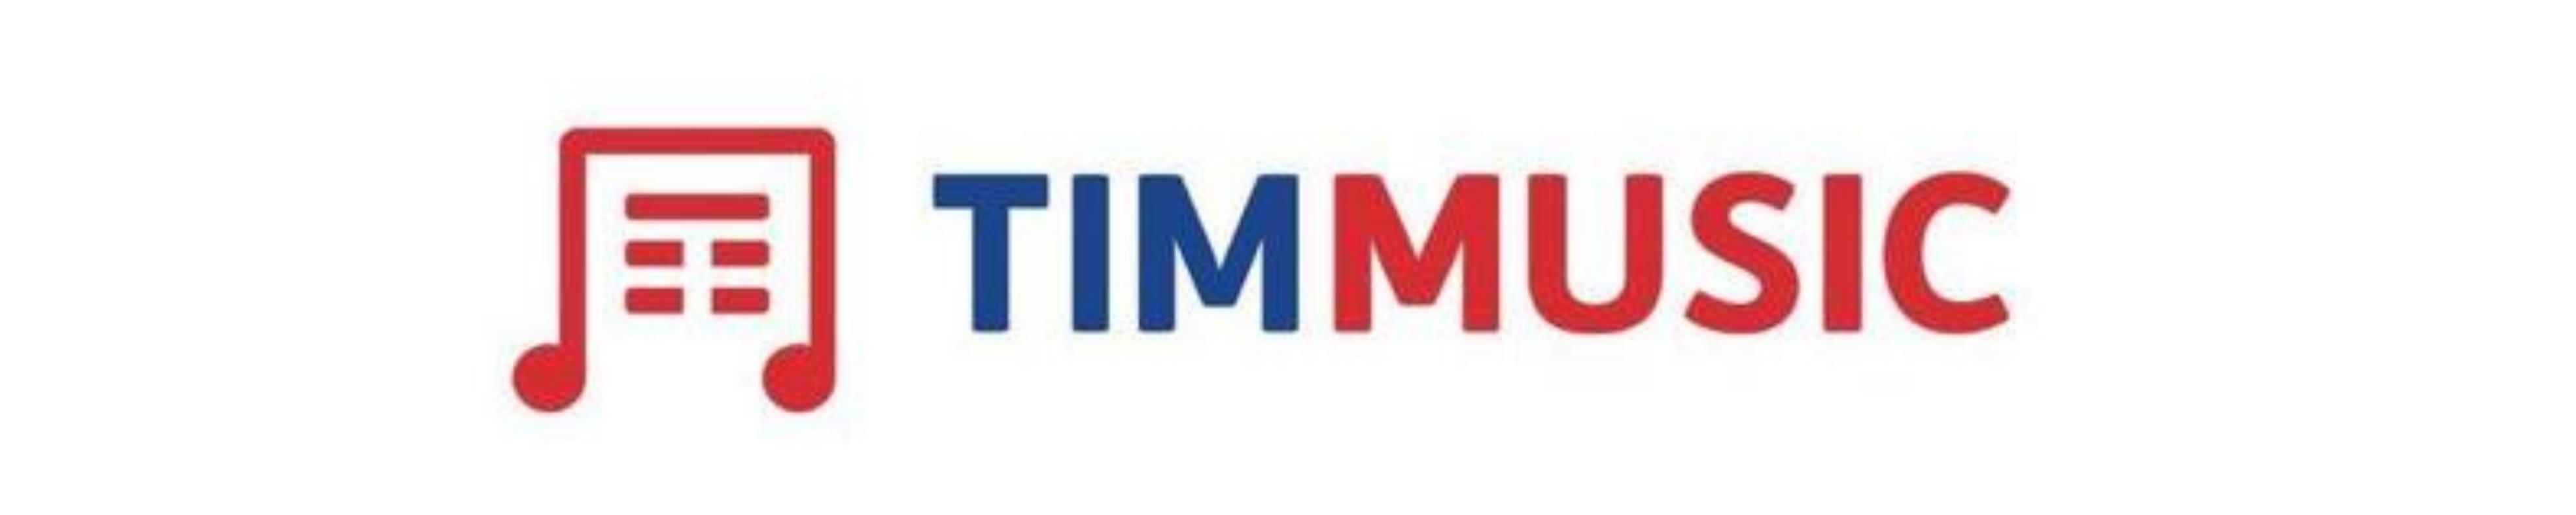 Timmusic Logo